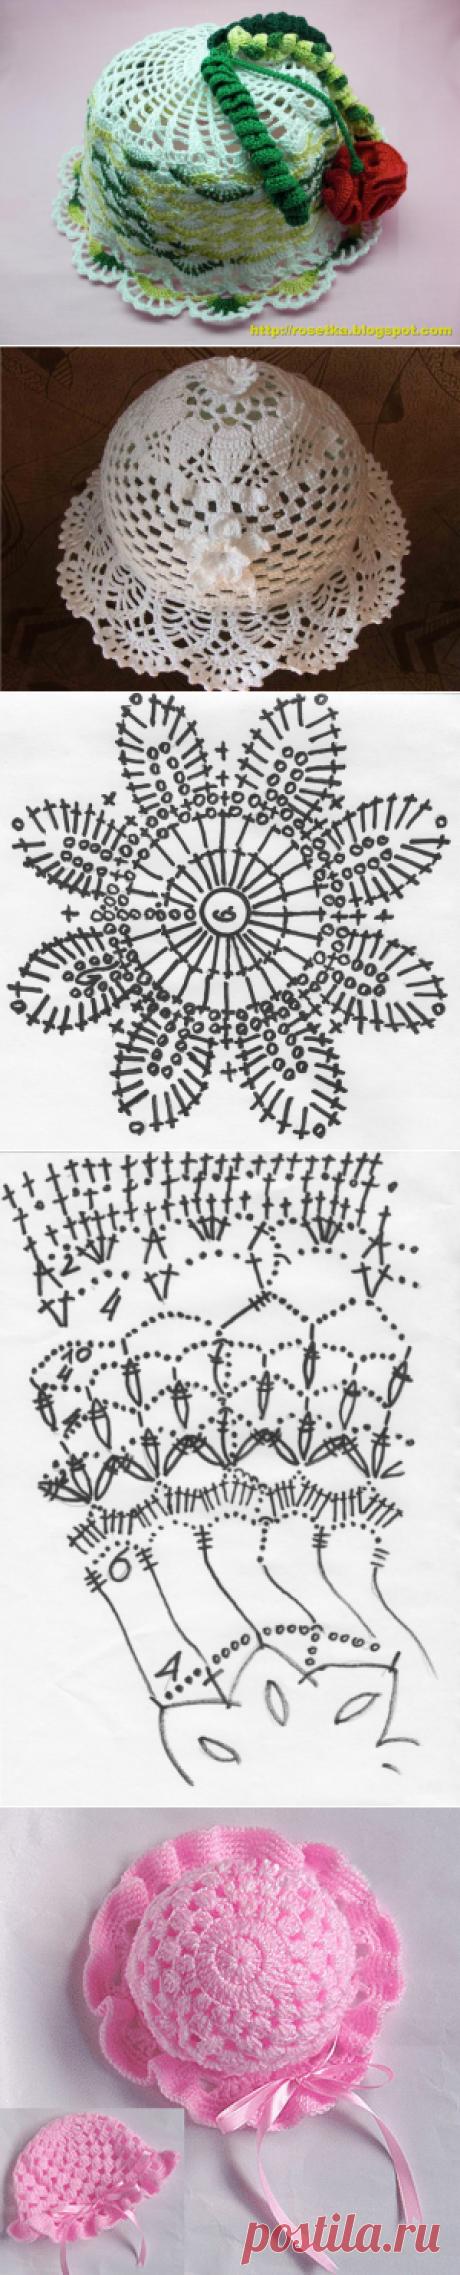 летние:панамки, bandady, la pañoleta | las Anotaciones en la rúbrica летние:панамки, bandady, la pañoleta | el Diario yaskrava zirka